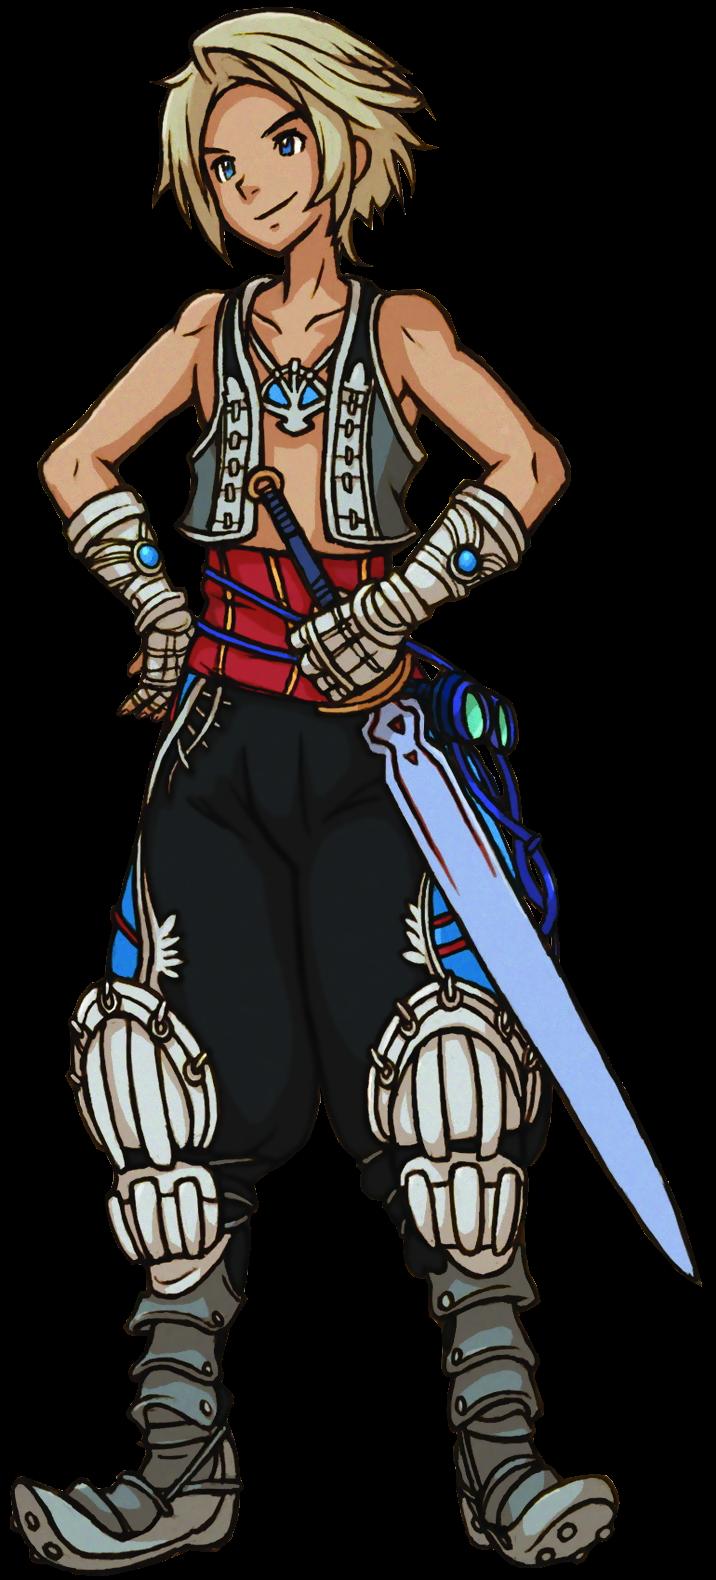 Final Fantasy XII: Revenant Wings concept art